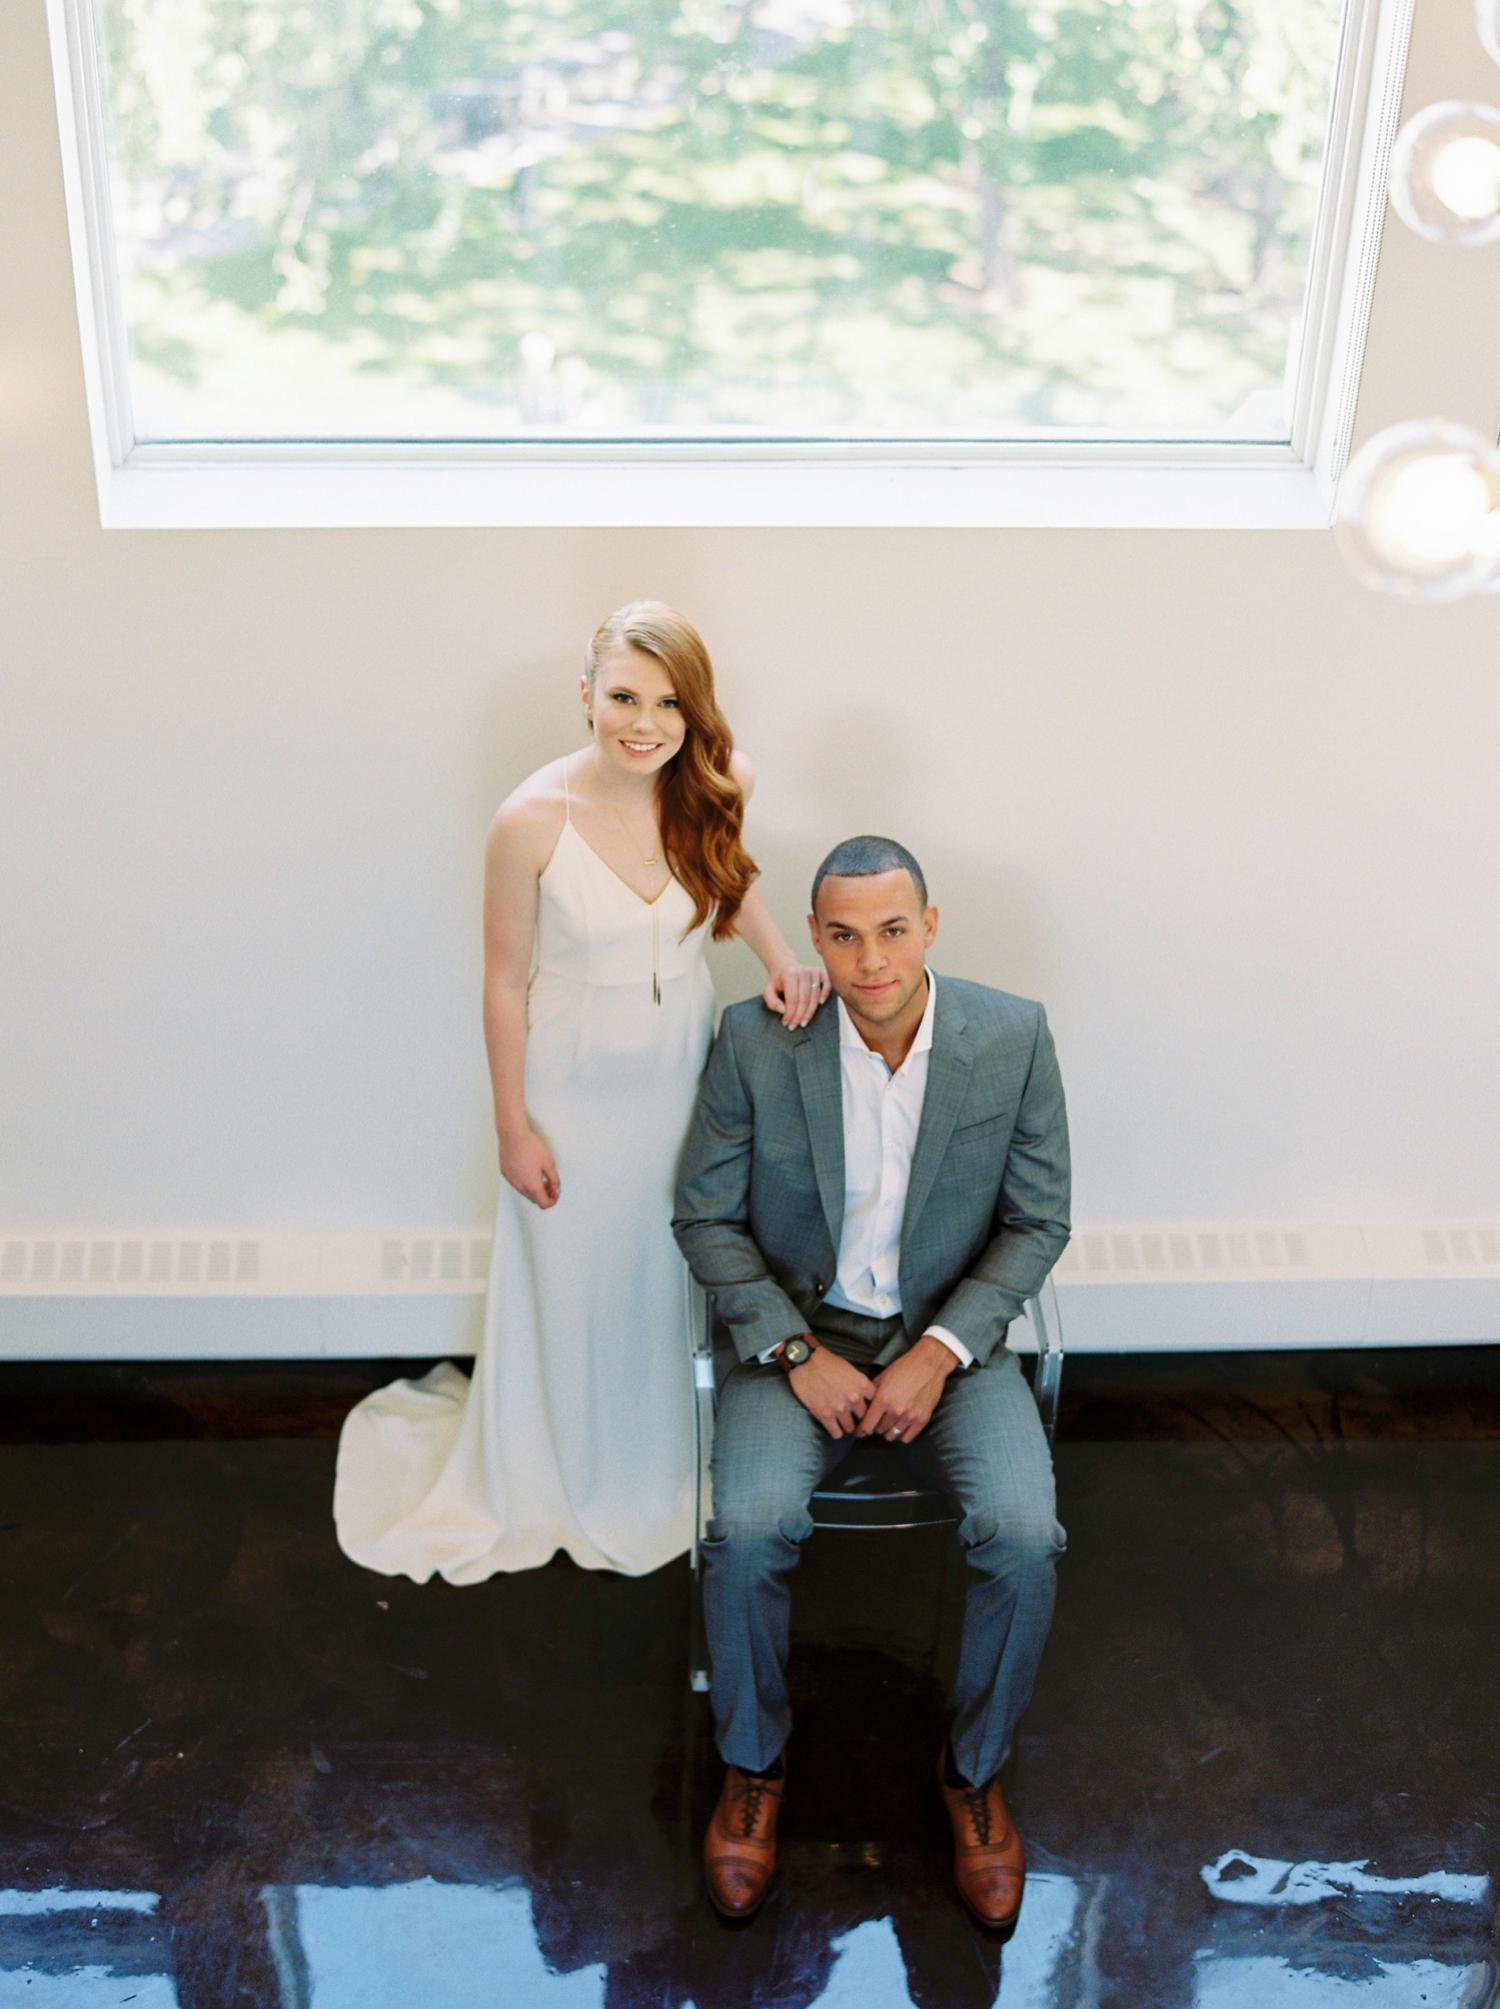 Calgary Wedding Photographers   Dote Magazine Wedding Editorial   Pearl & Dot Pick Up Parlour